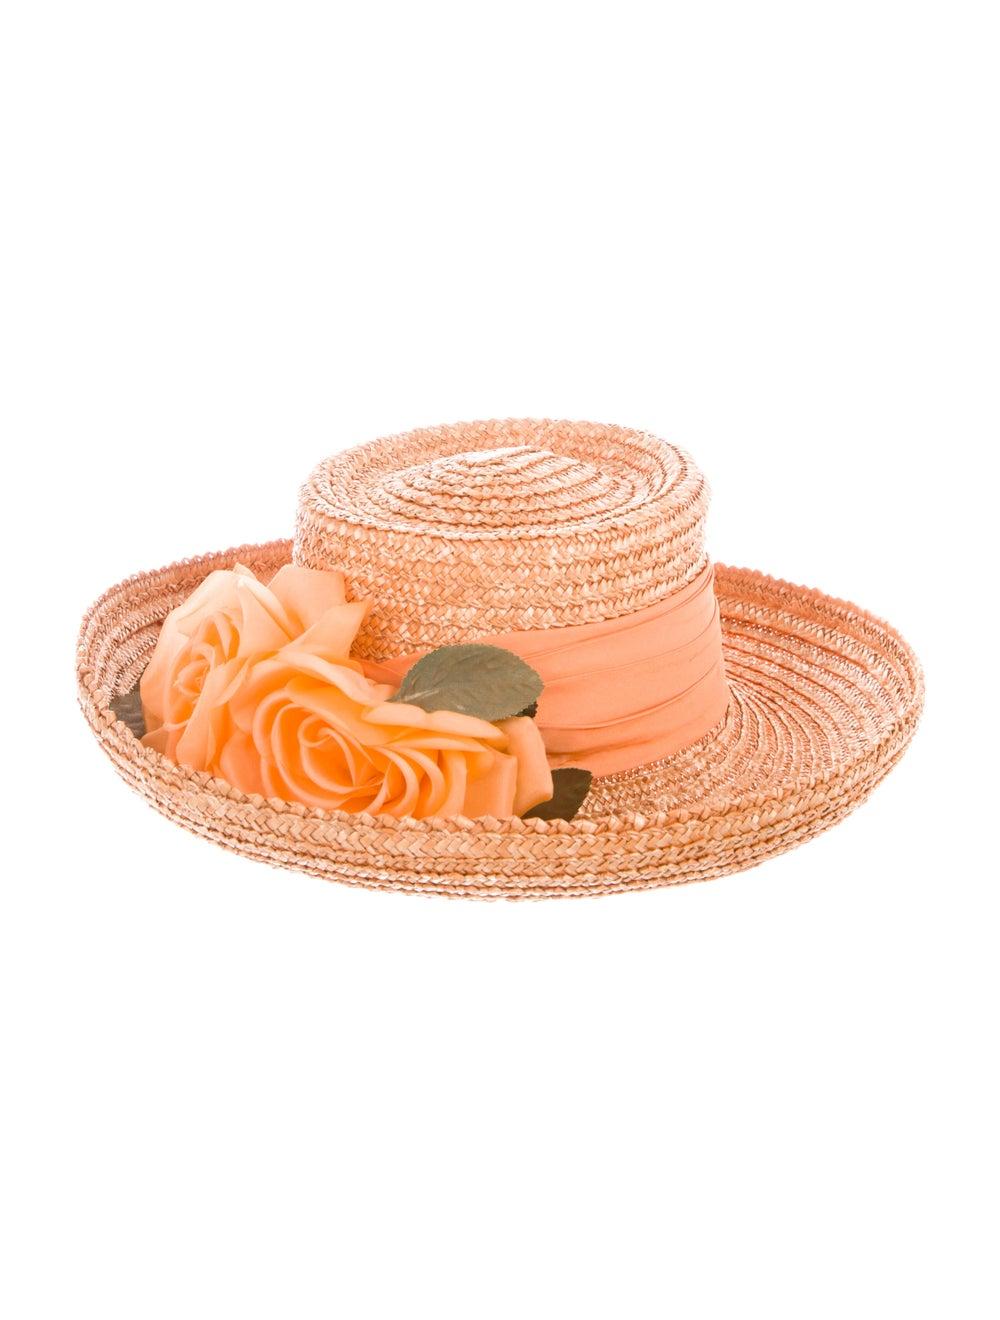 Eric Javits Straw Wide Brim Hat - image 2